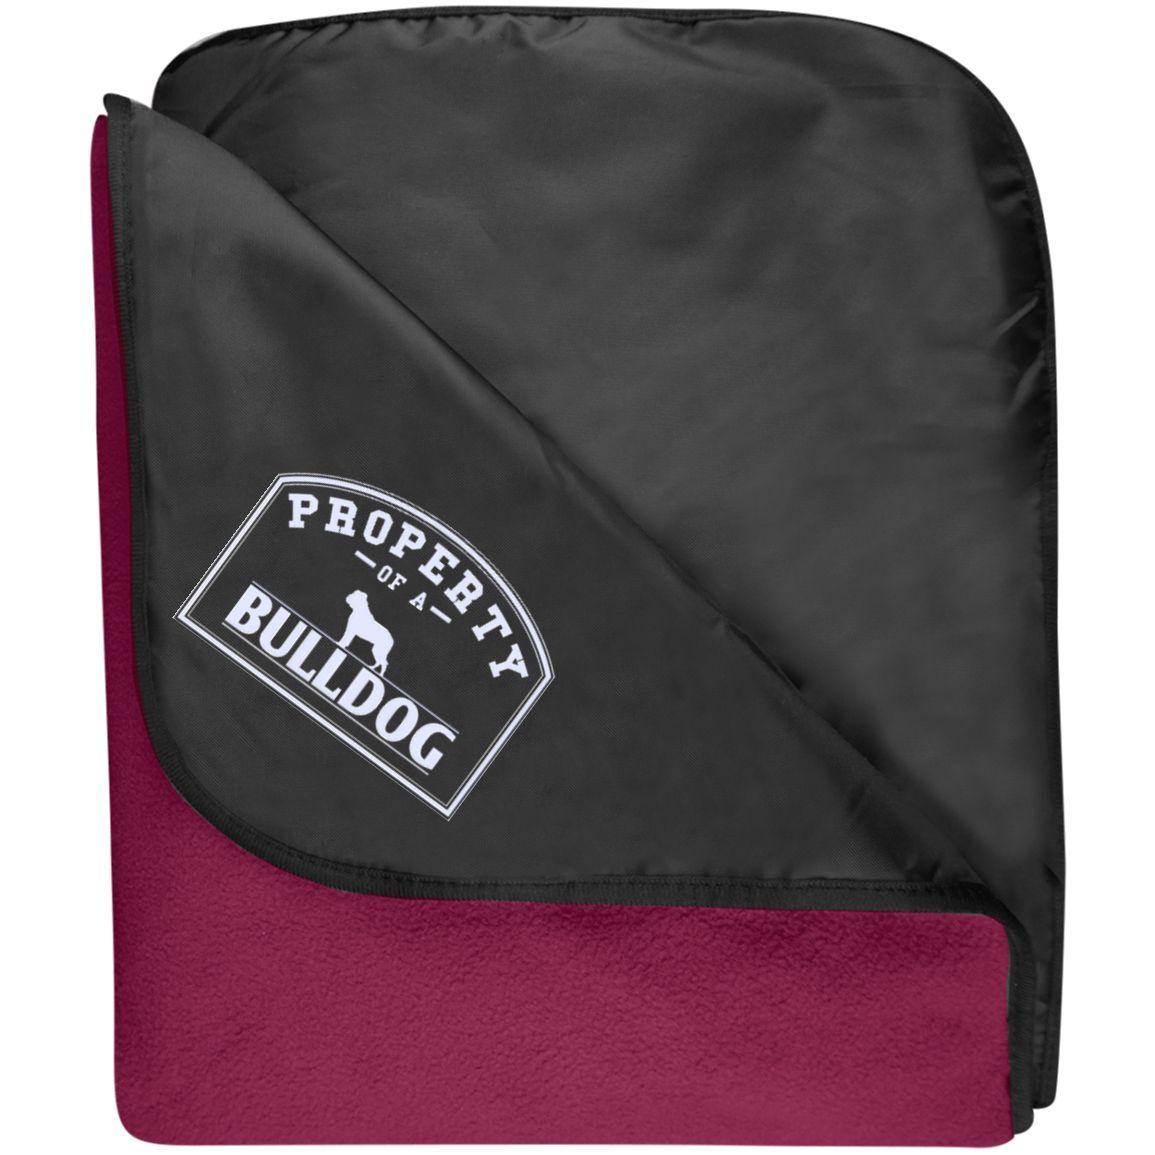 I Love My Bulldog - Fleece & Poly Travel Blanket (Embroidered)